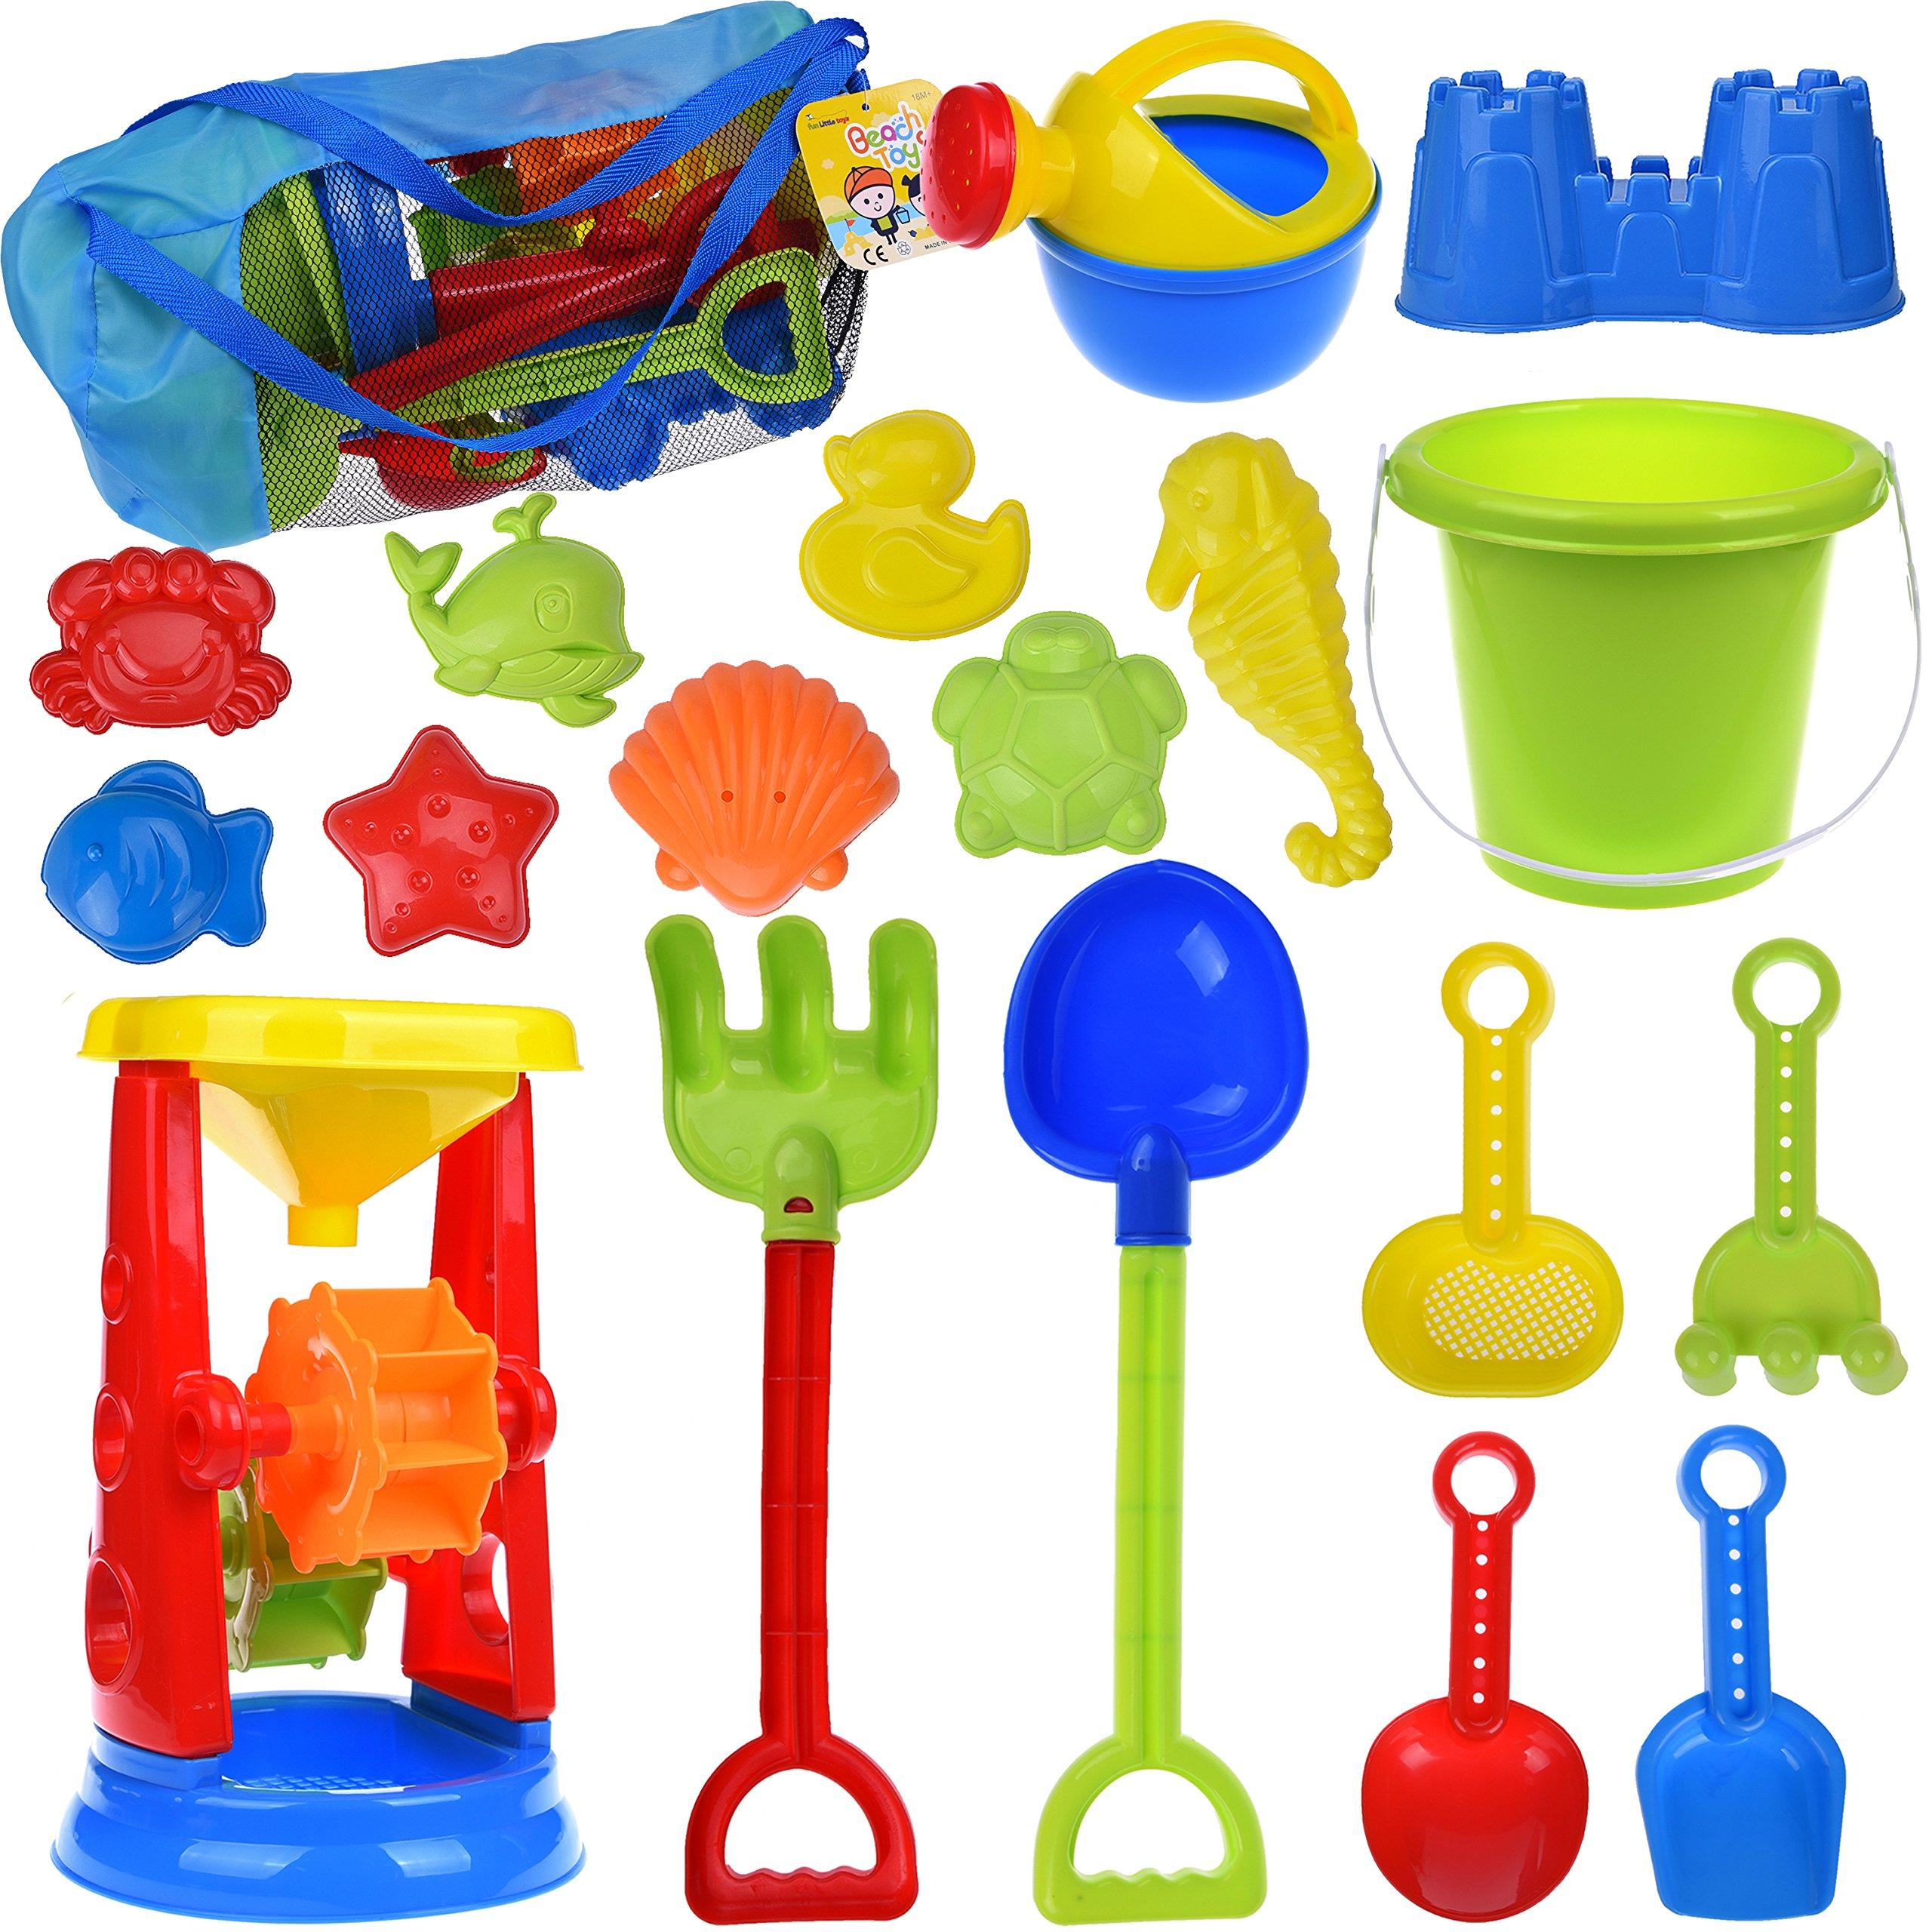 19 PCs Kids Beach Sand Toys Set Sand Water Wheel, Beach Molds, Beach Bucket Beach Shovel Tool Kit, Sandbox Toys for Toddlers, Kids Outdoor Toys by FUN LITTLE TOYS